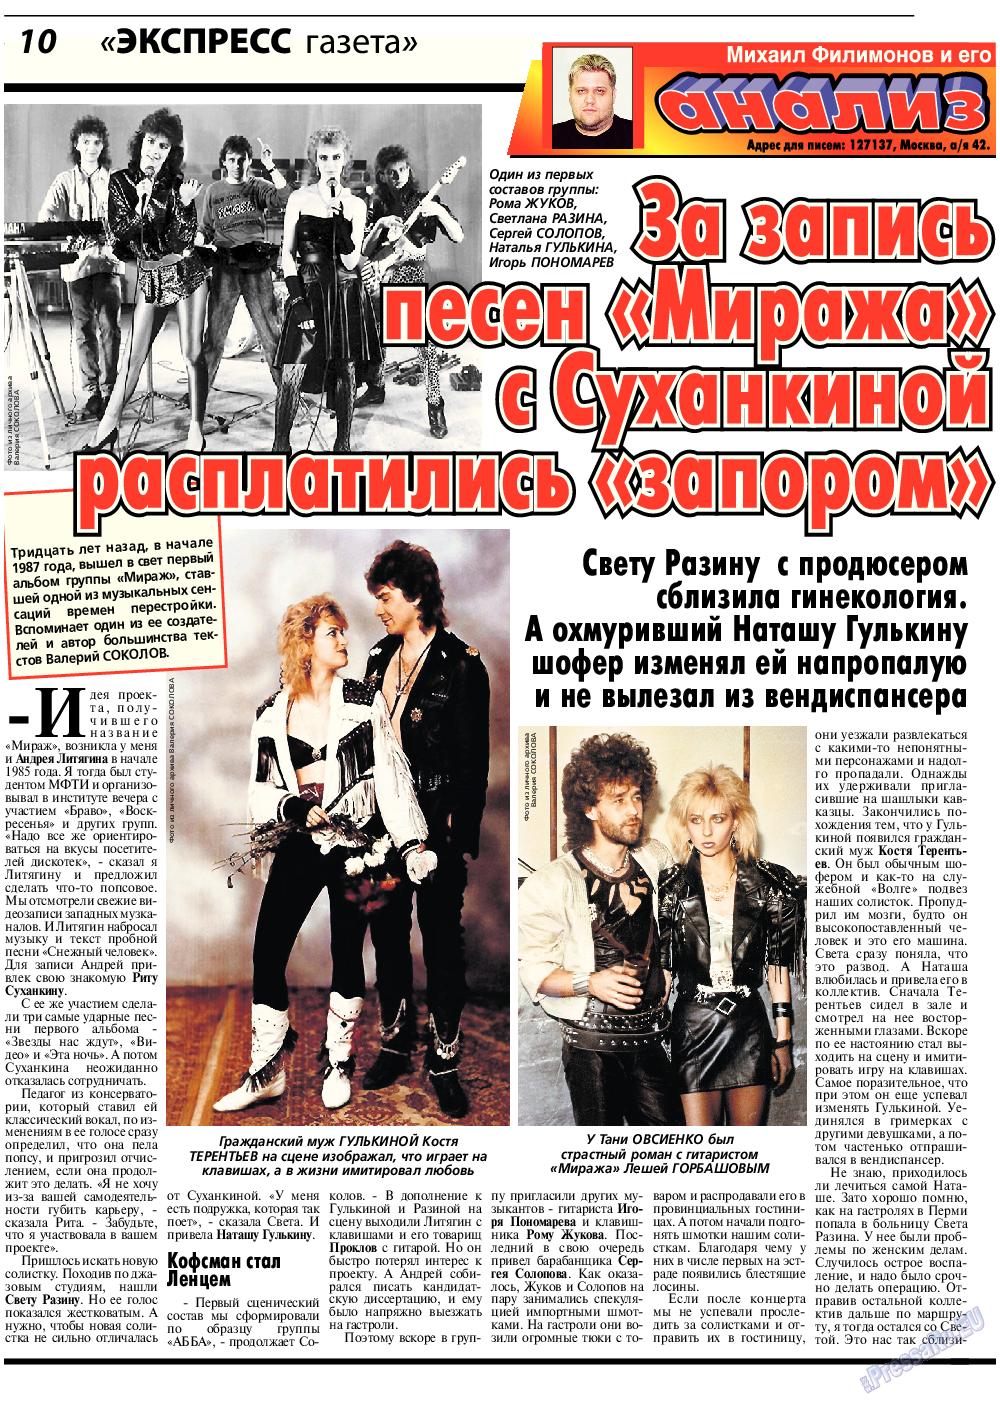 Экспресс газета (газета). 2017 год, номер 2, стр. 10